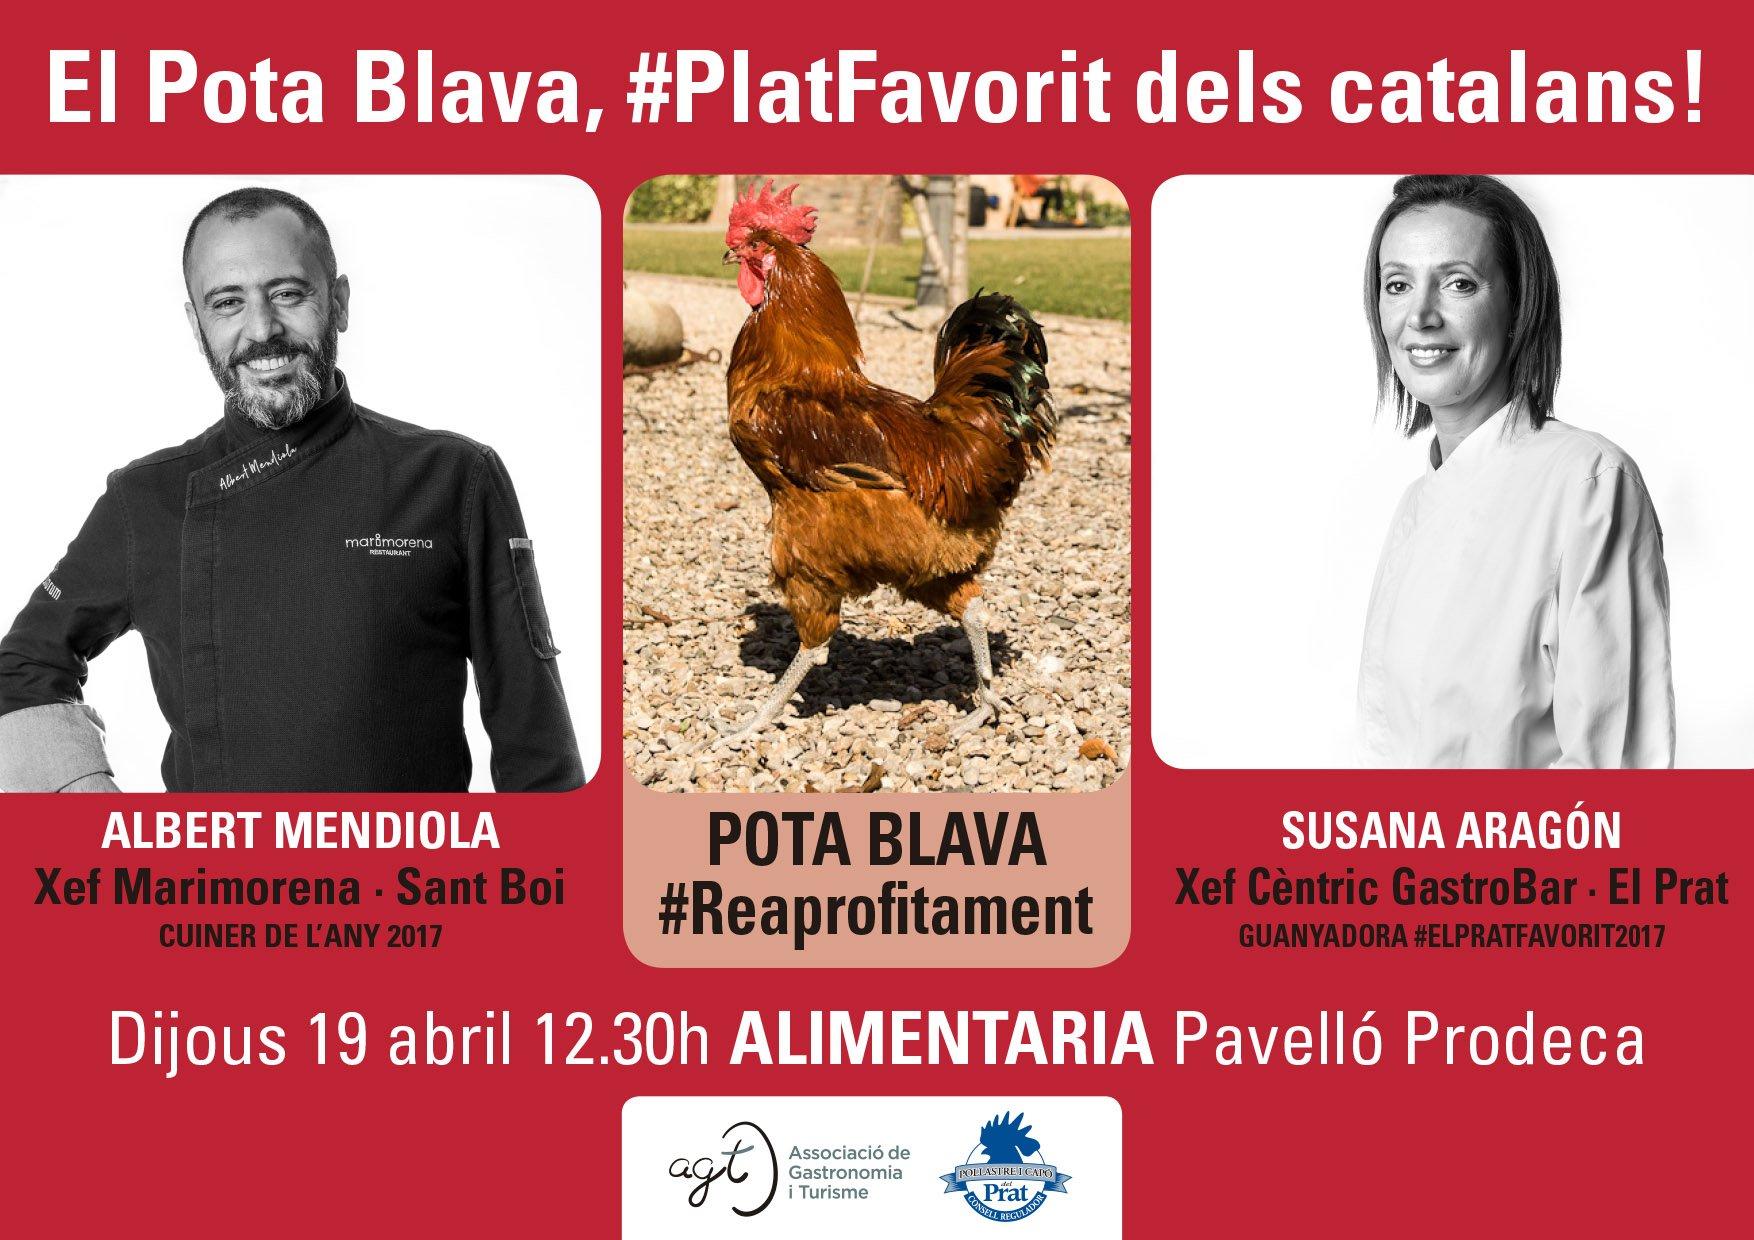 Showcooking STOP FOODWASTE - El pota blava #platfavorit dels catalans!